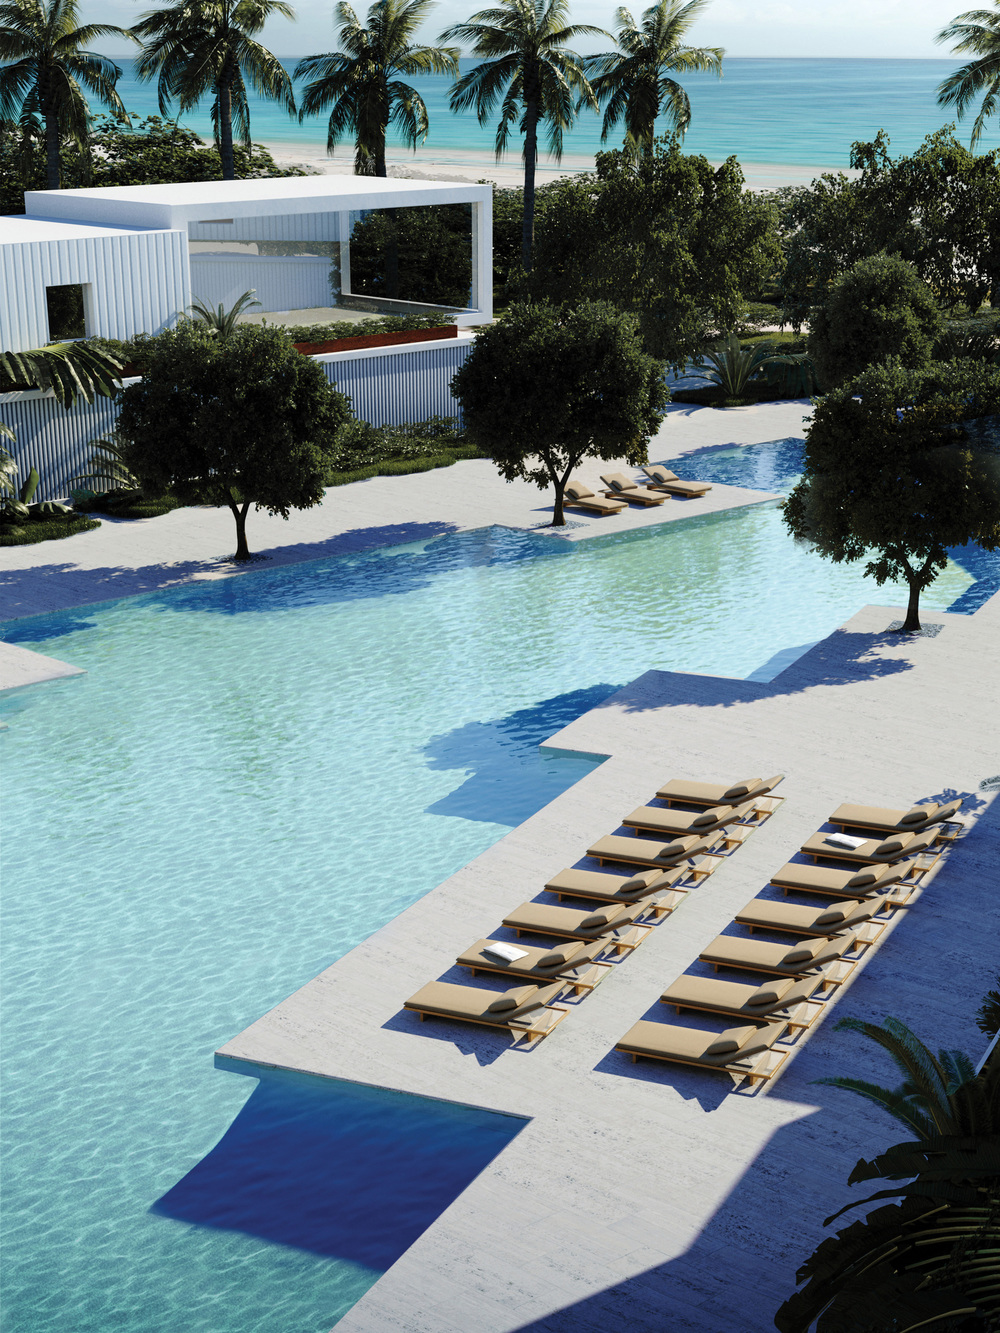 06-Fasano-SC-PoolBeach-House-Crop.jpg